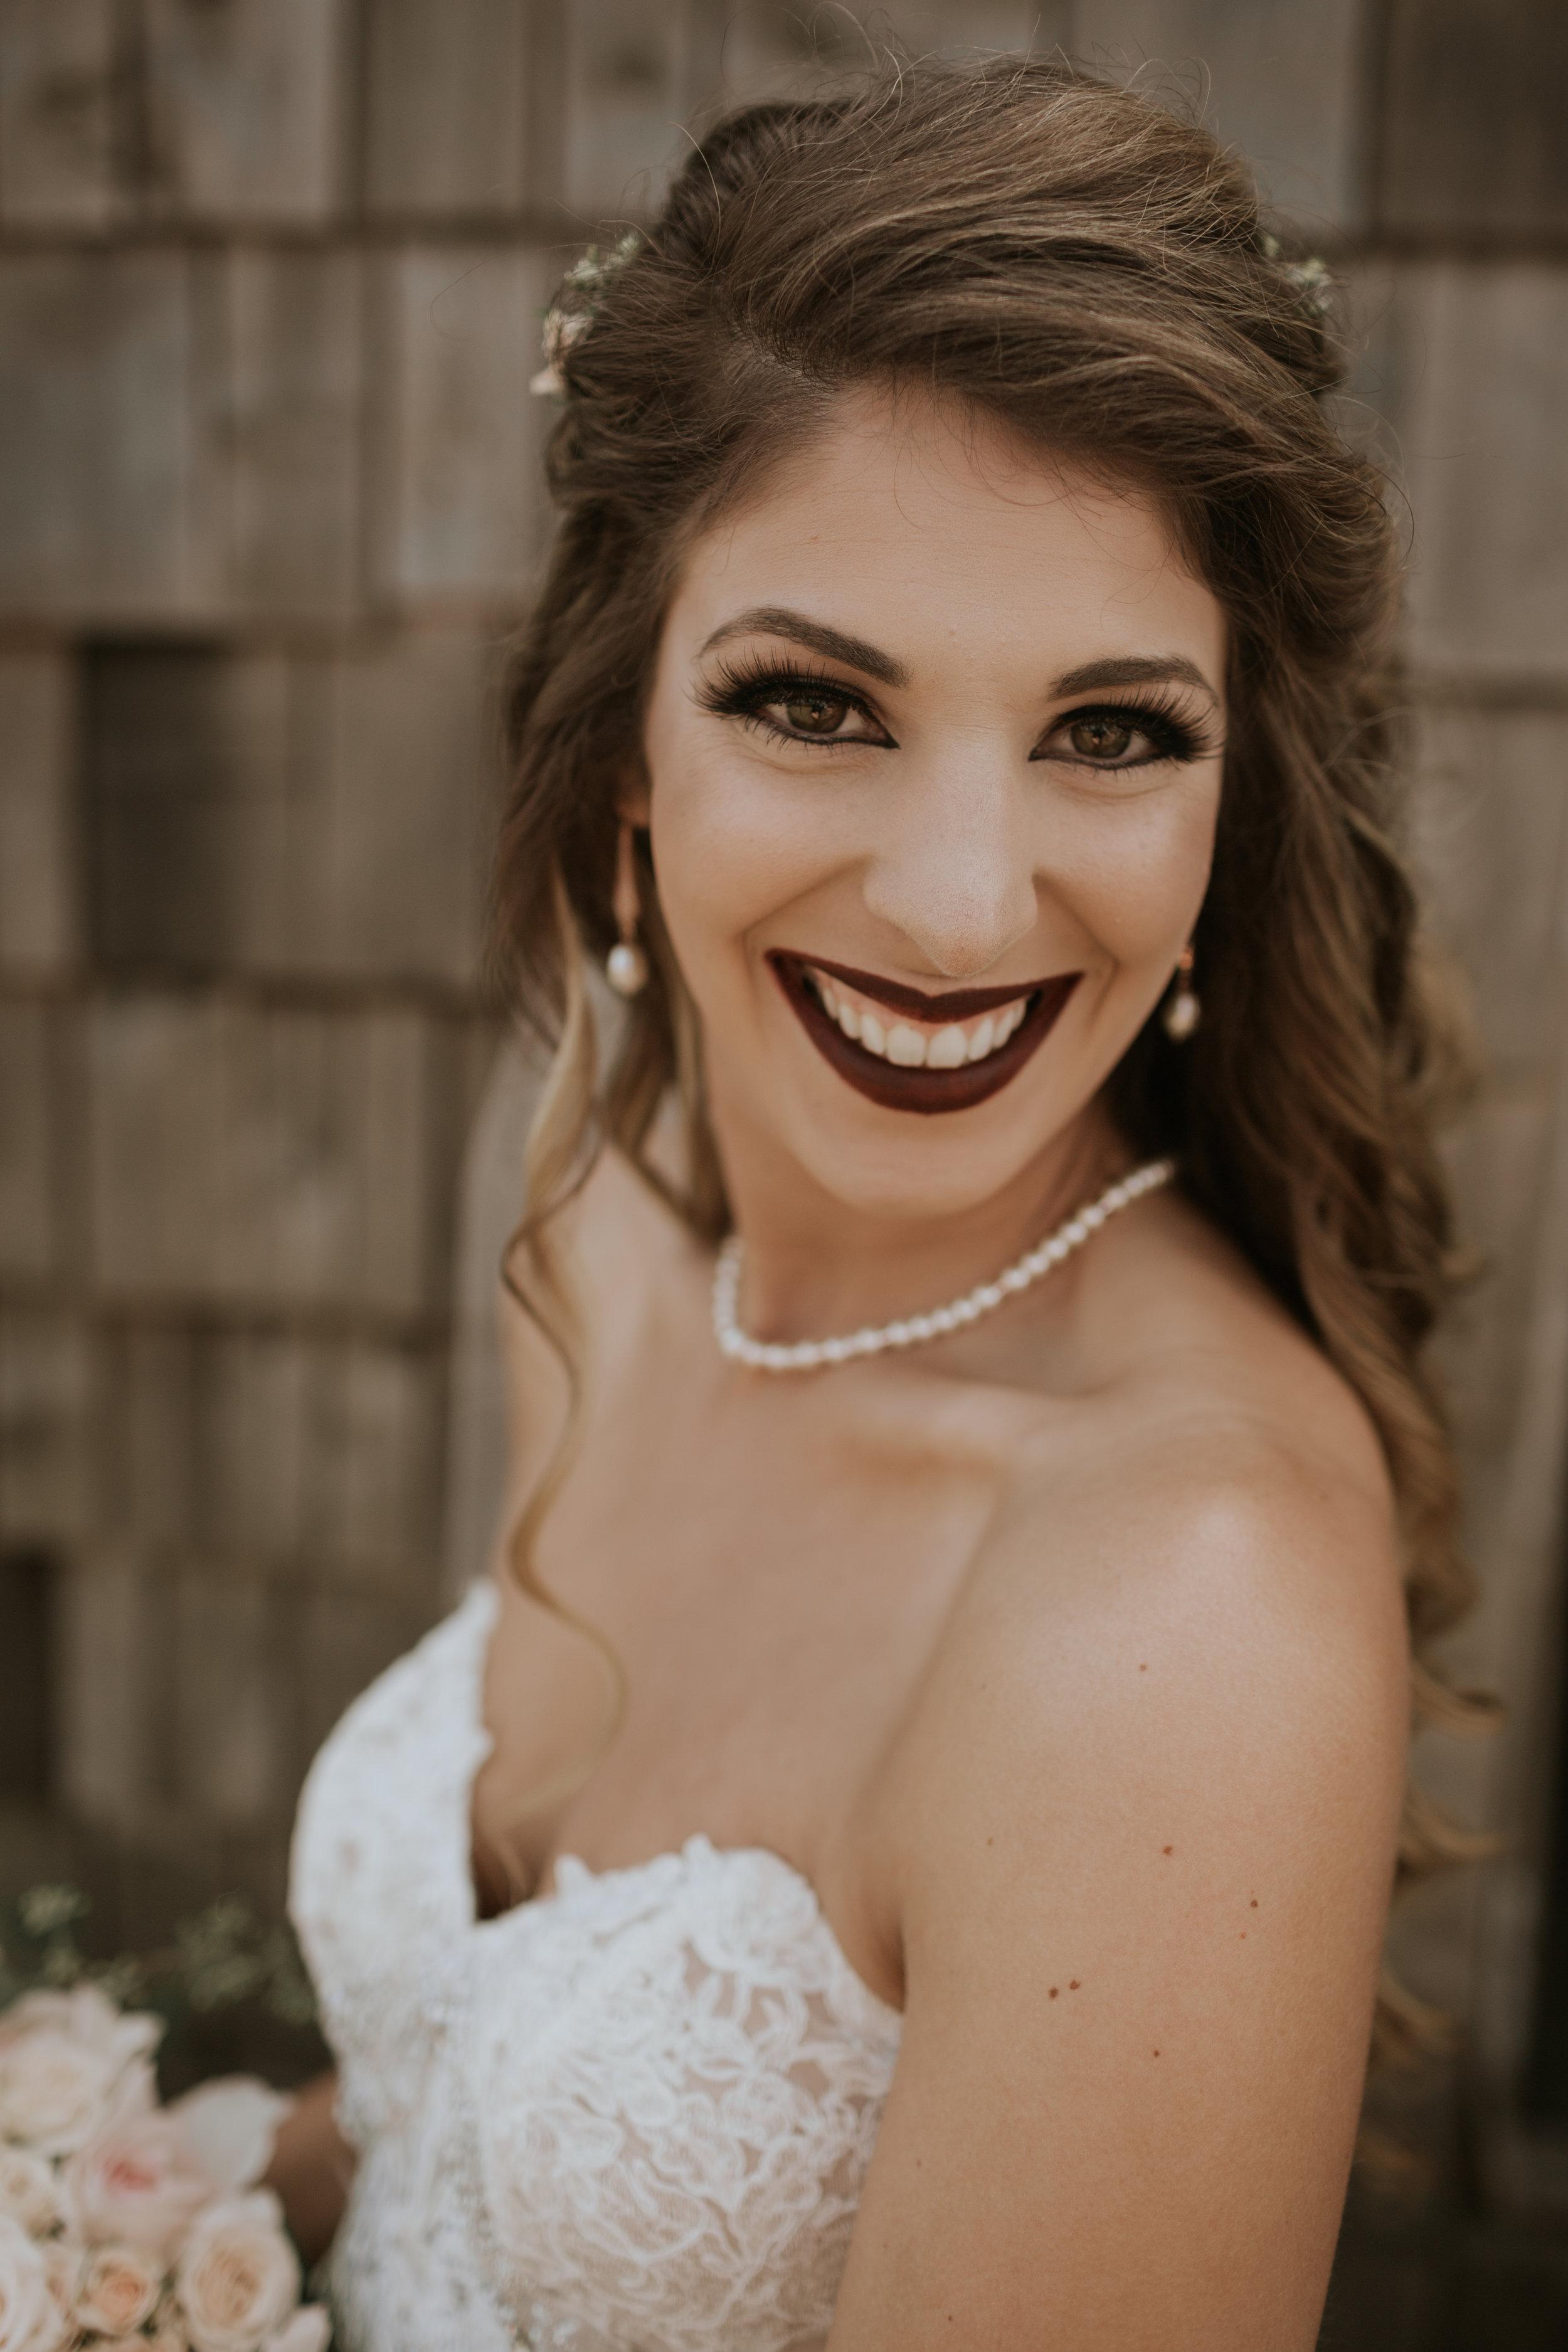 Olympic-Peninsula-Wedding-Photographer-PNW-Forks-Port-Angeles-Kayla-Dawn-Photography-engagement-Olympic-National-Park-111.jpg